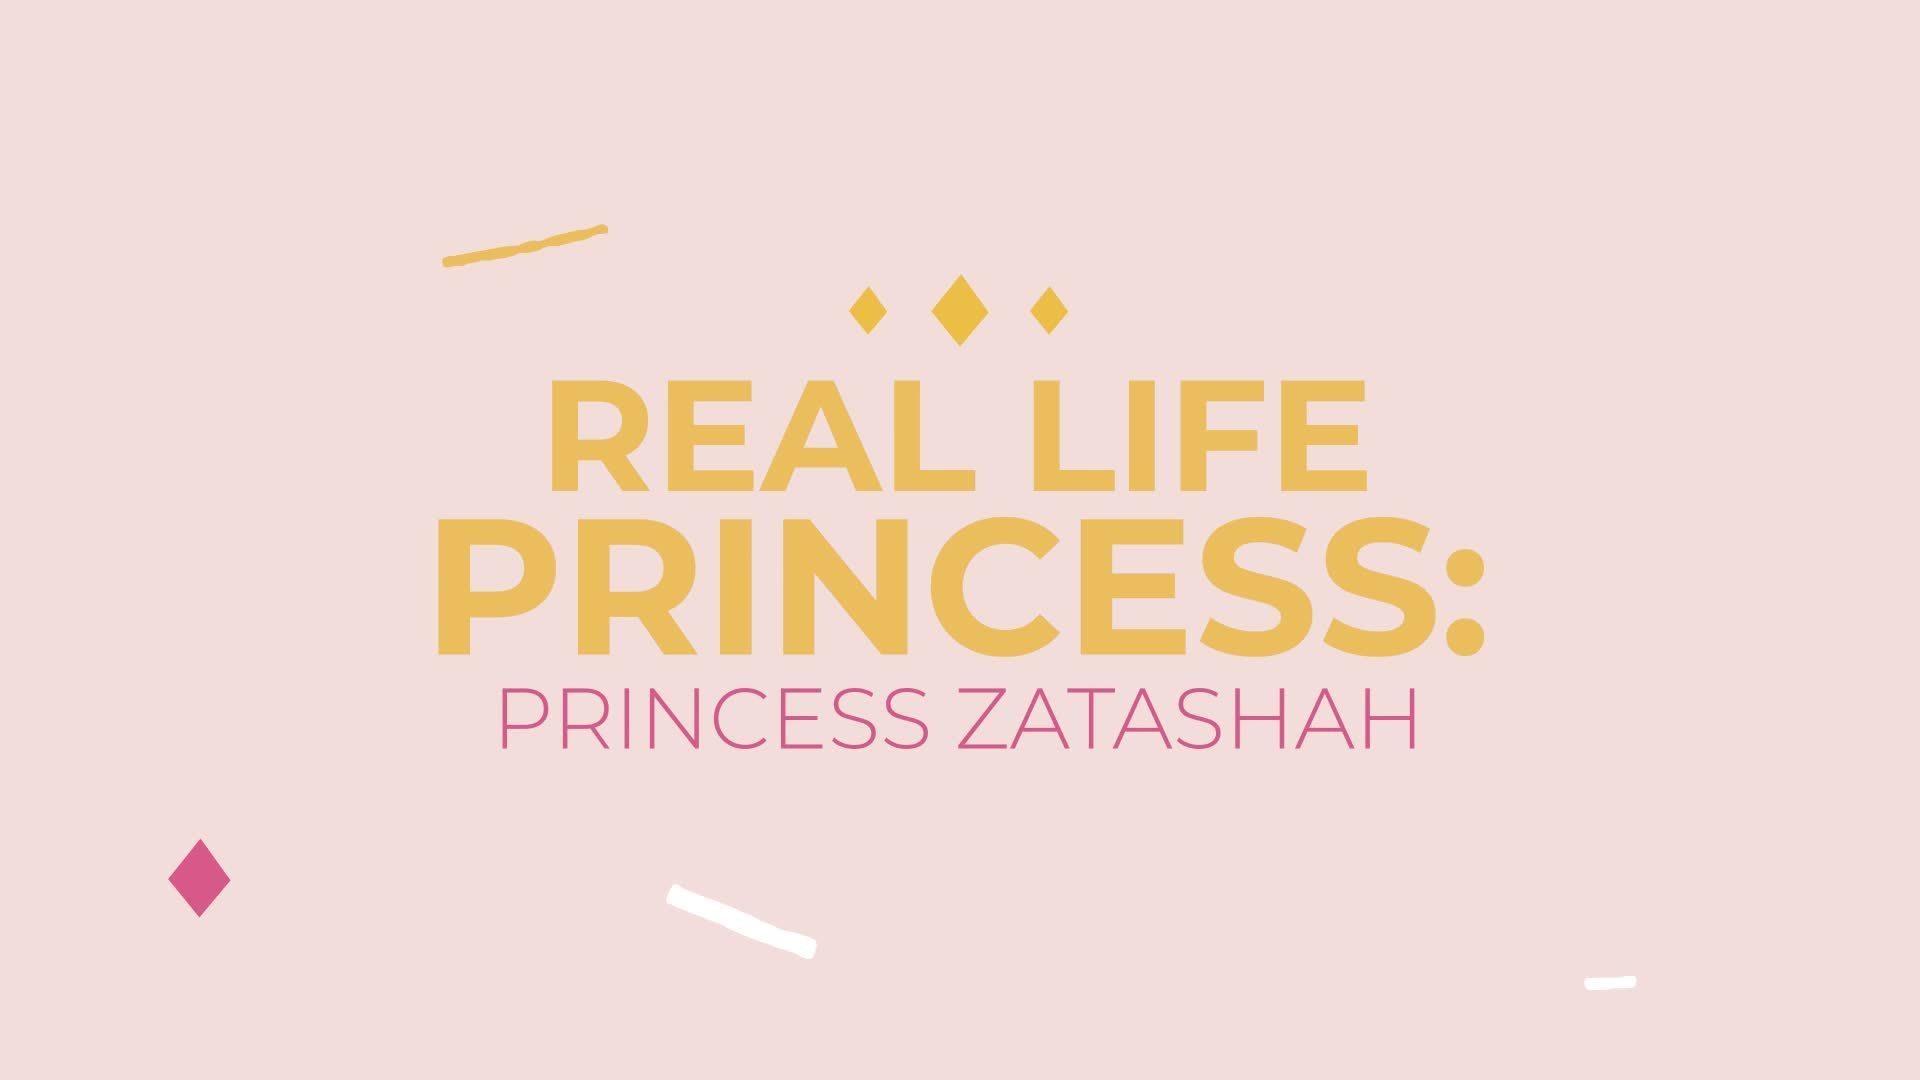 A Special Message from Princess Zatashah, a Real-Life Malaysian Princess